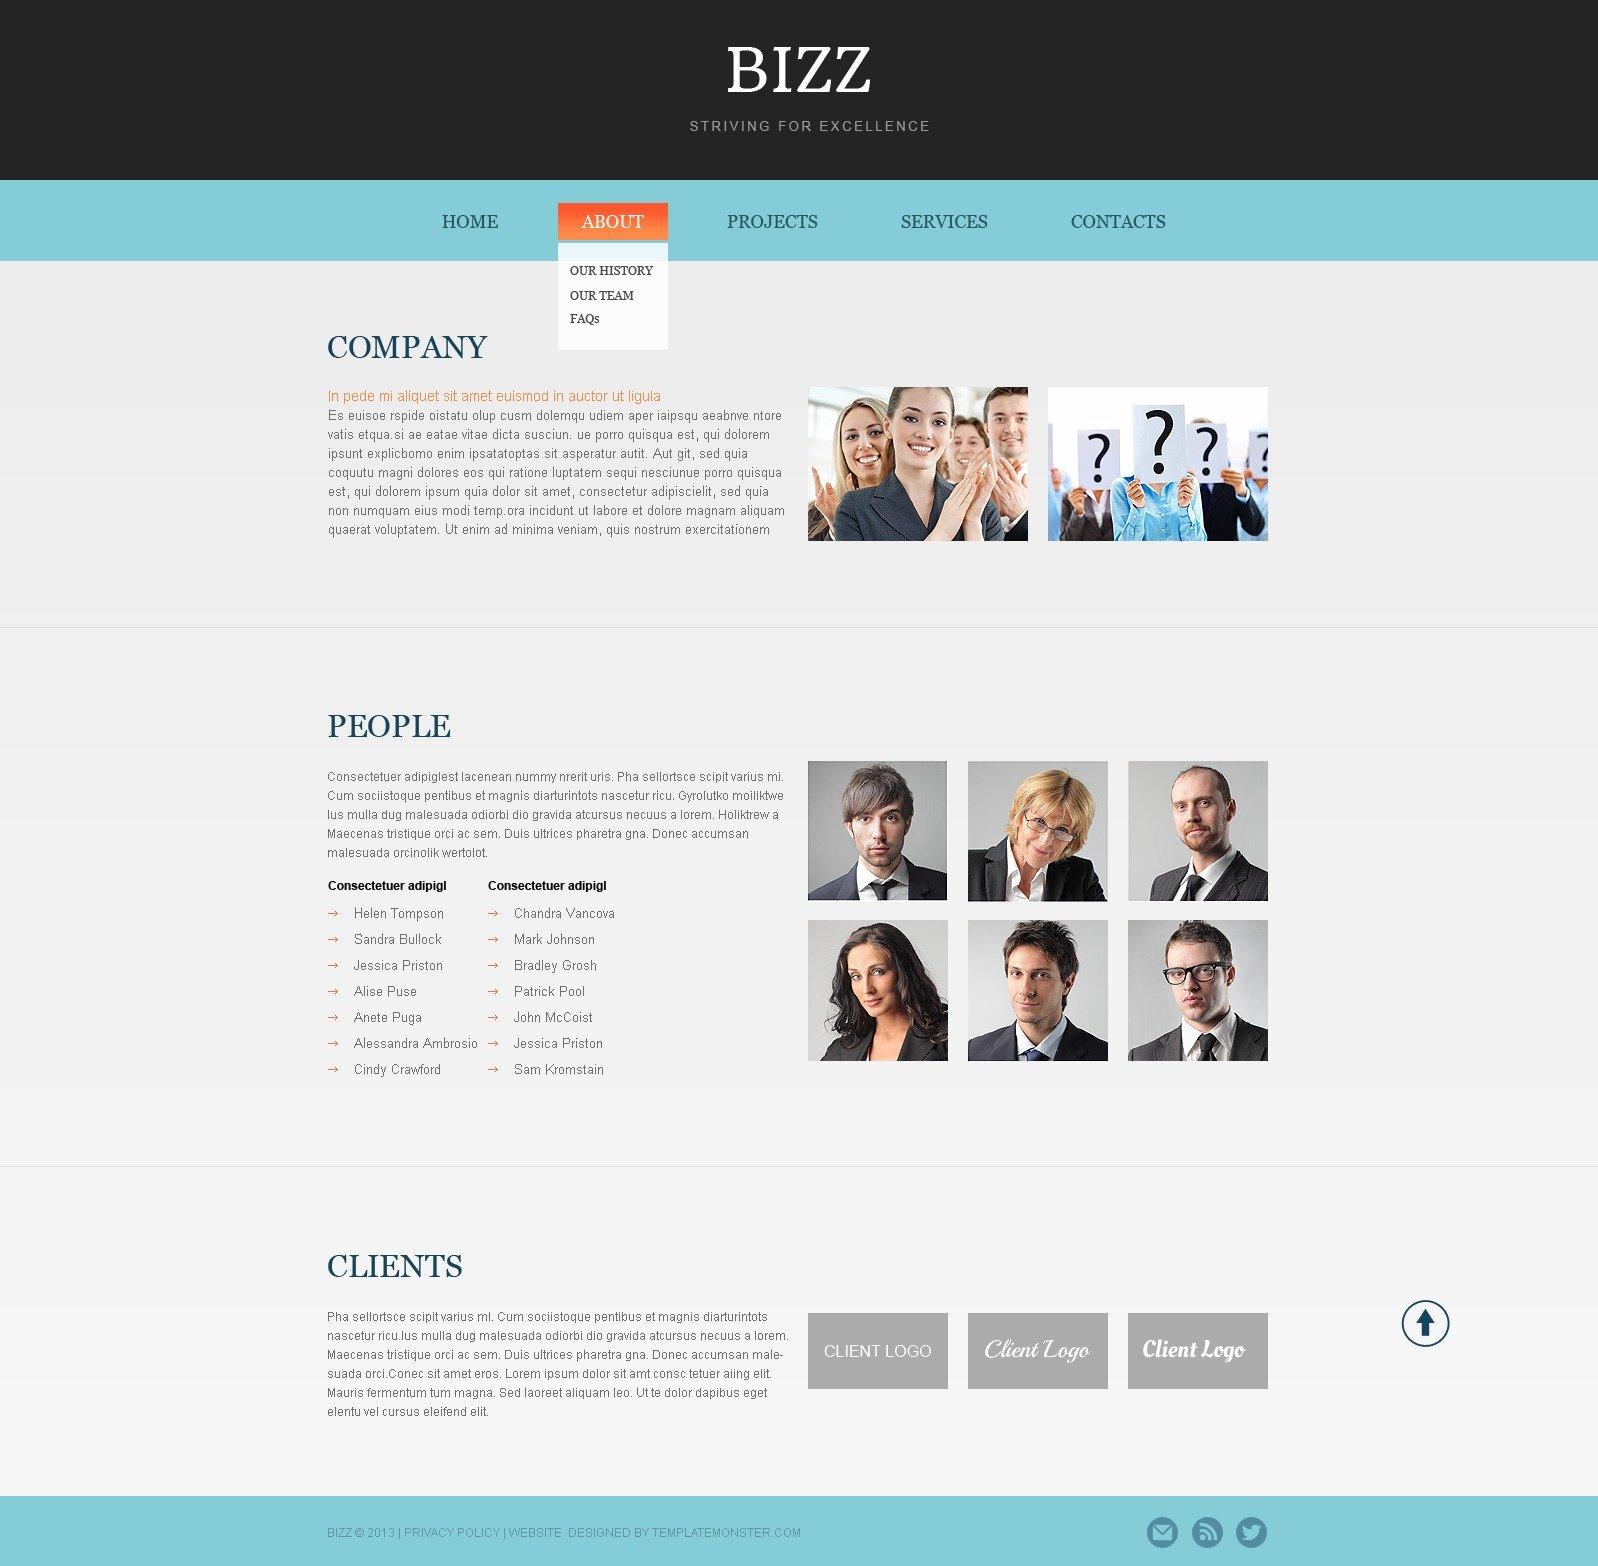 Free HTML5 Business Theme Website Template - screenshot